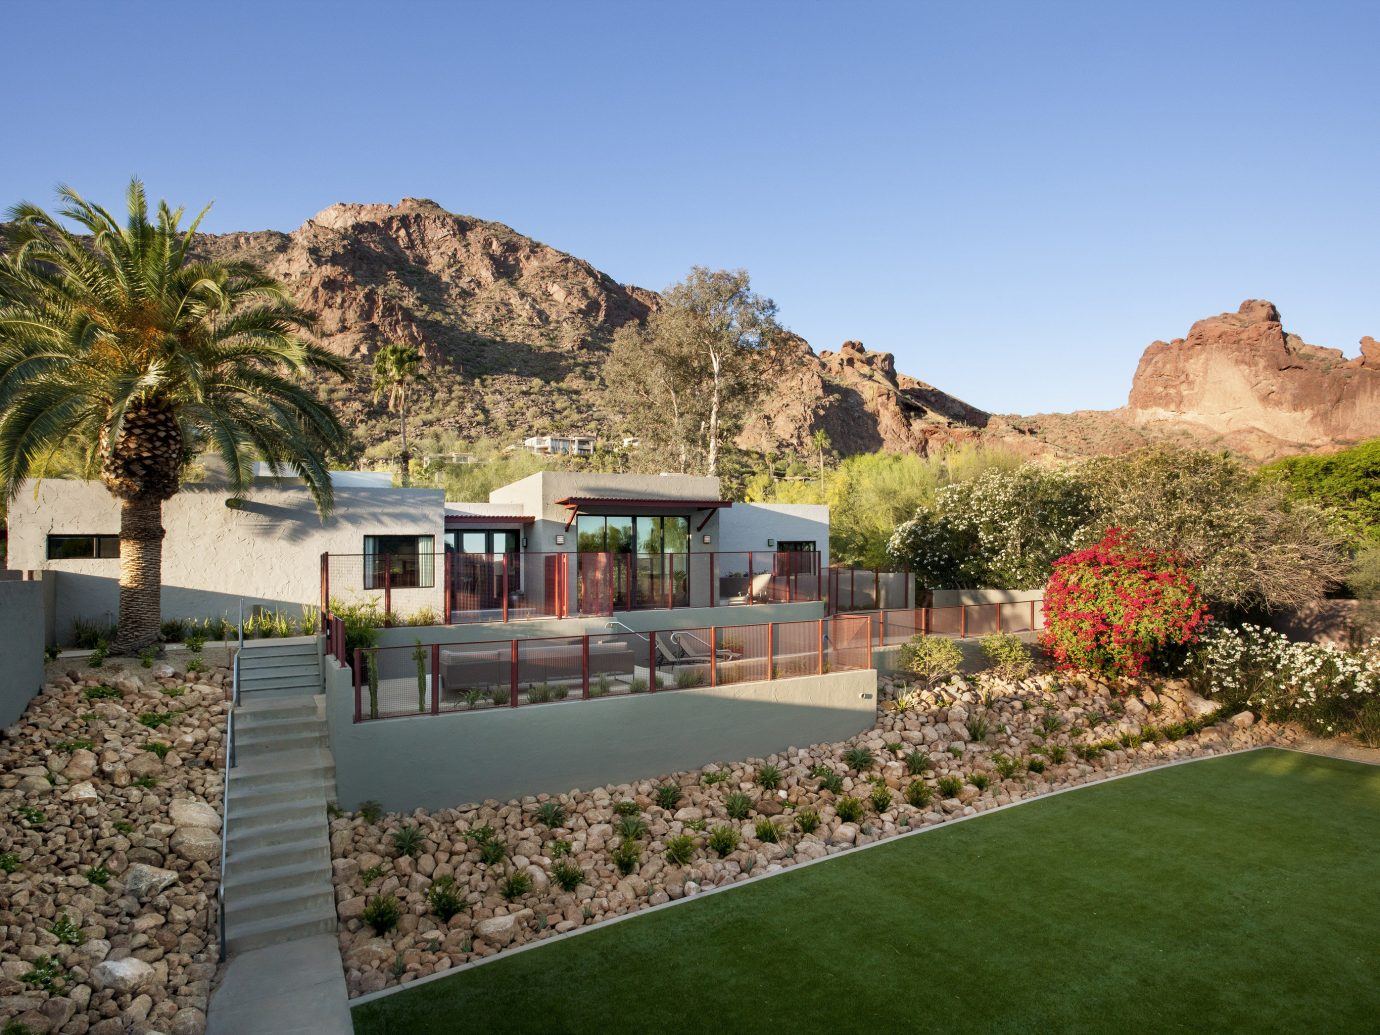 Health + Wellness Hotels Spa Retreats grass sky outdoor property estate mountain vacation landscape real estate home flower Villa Garden lawn